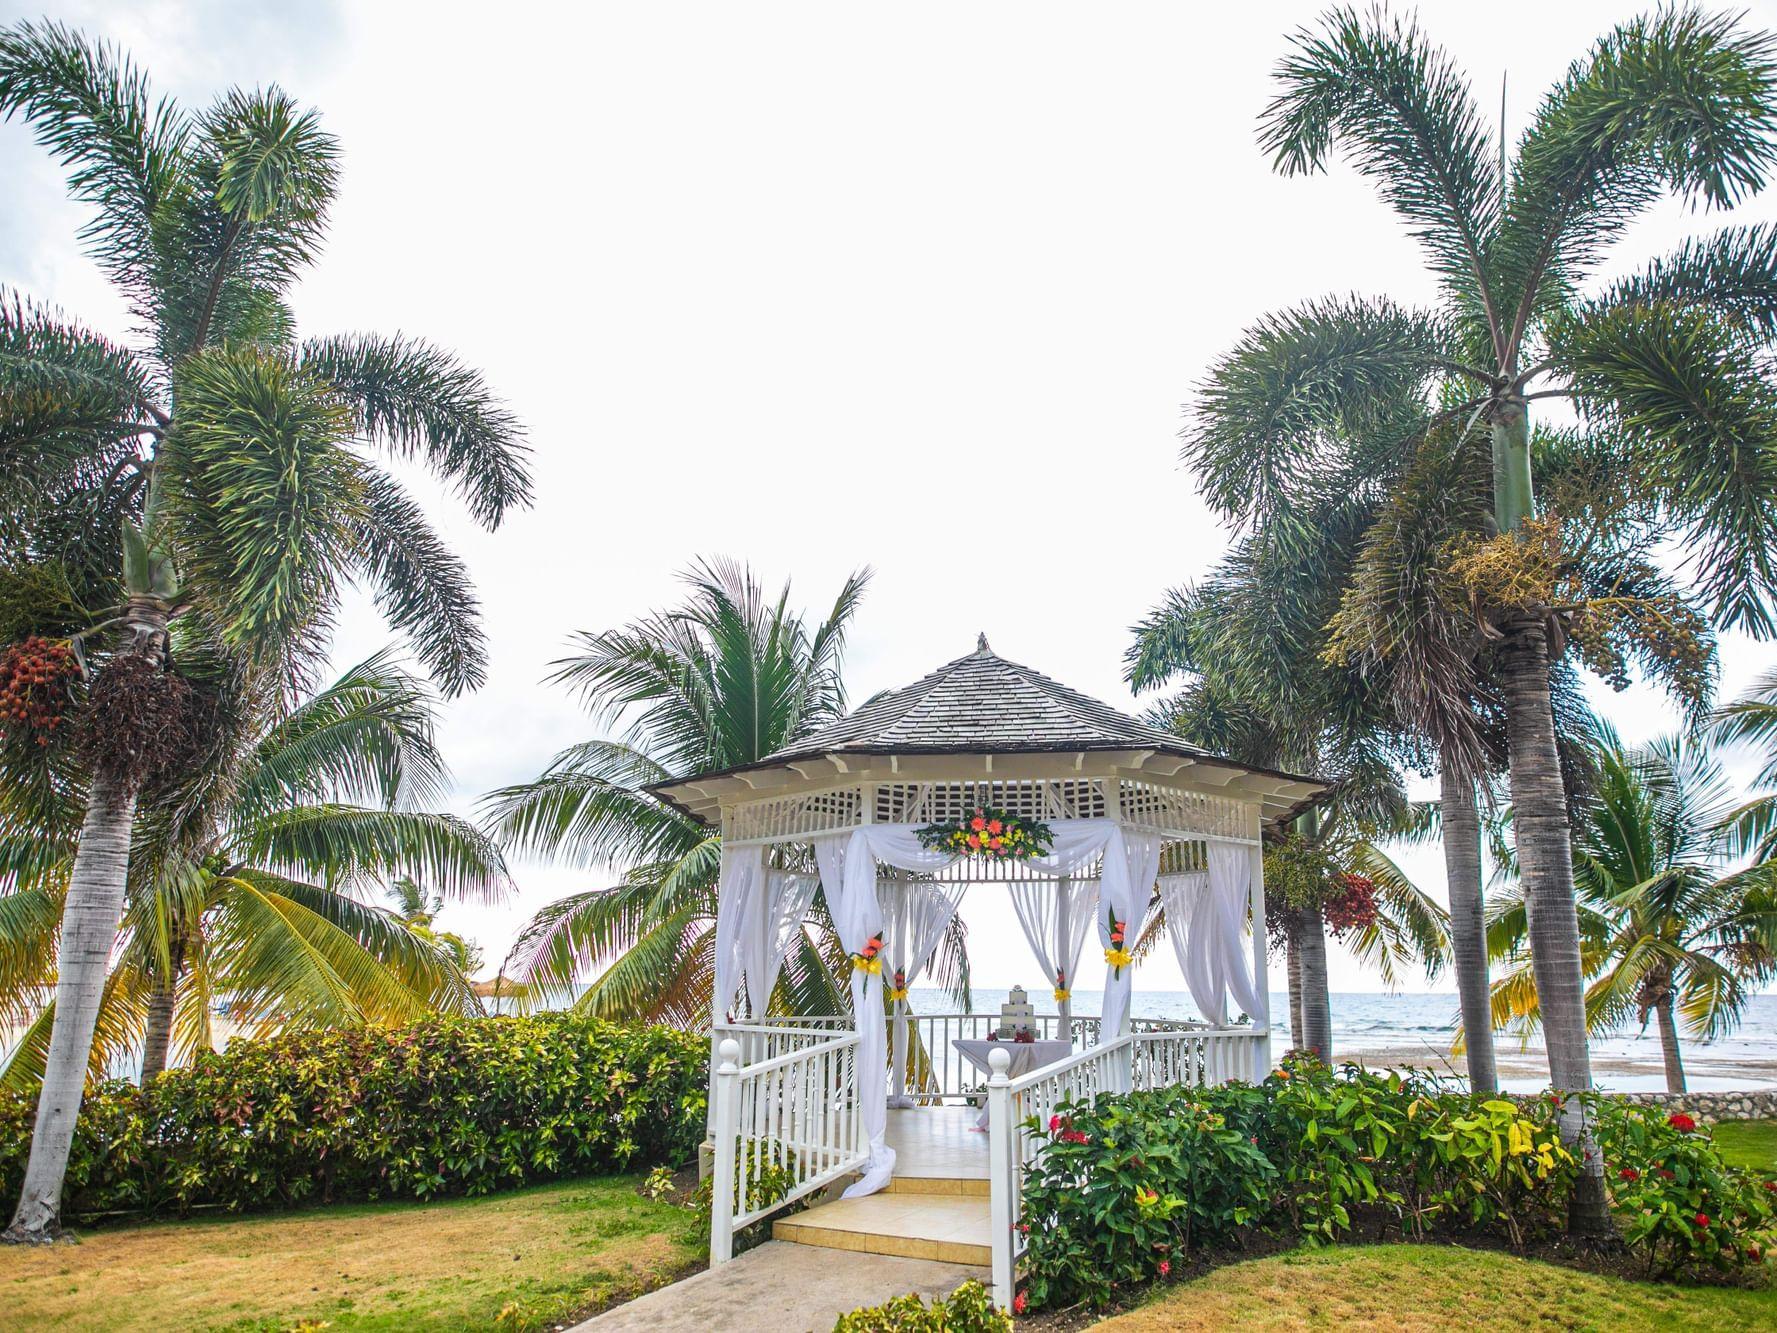 Landscape shot of Cupid Gazebo at Holiday Inn Montego Bay